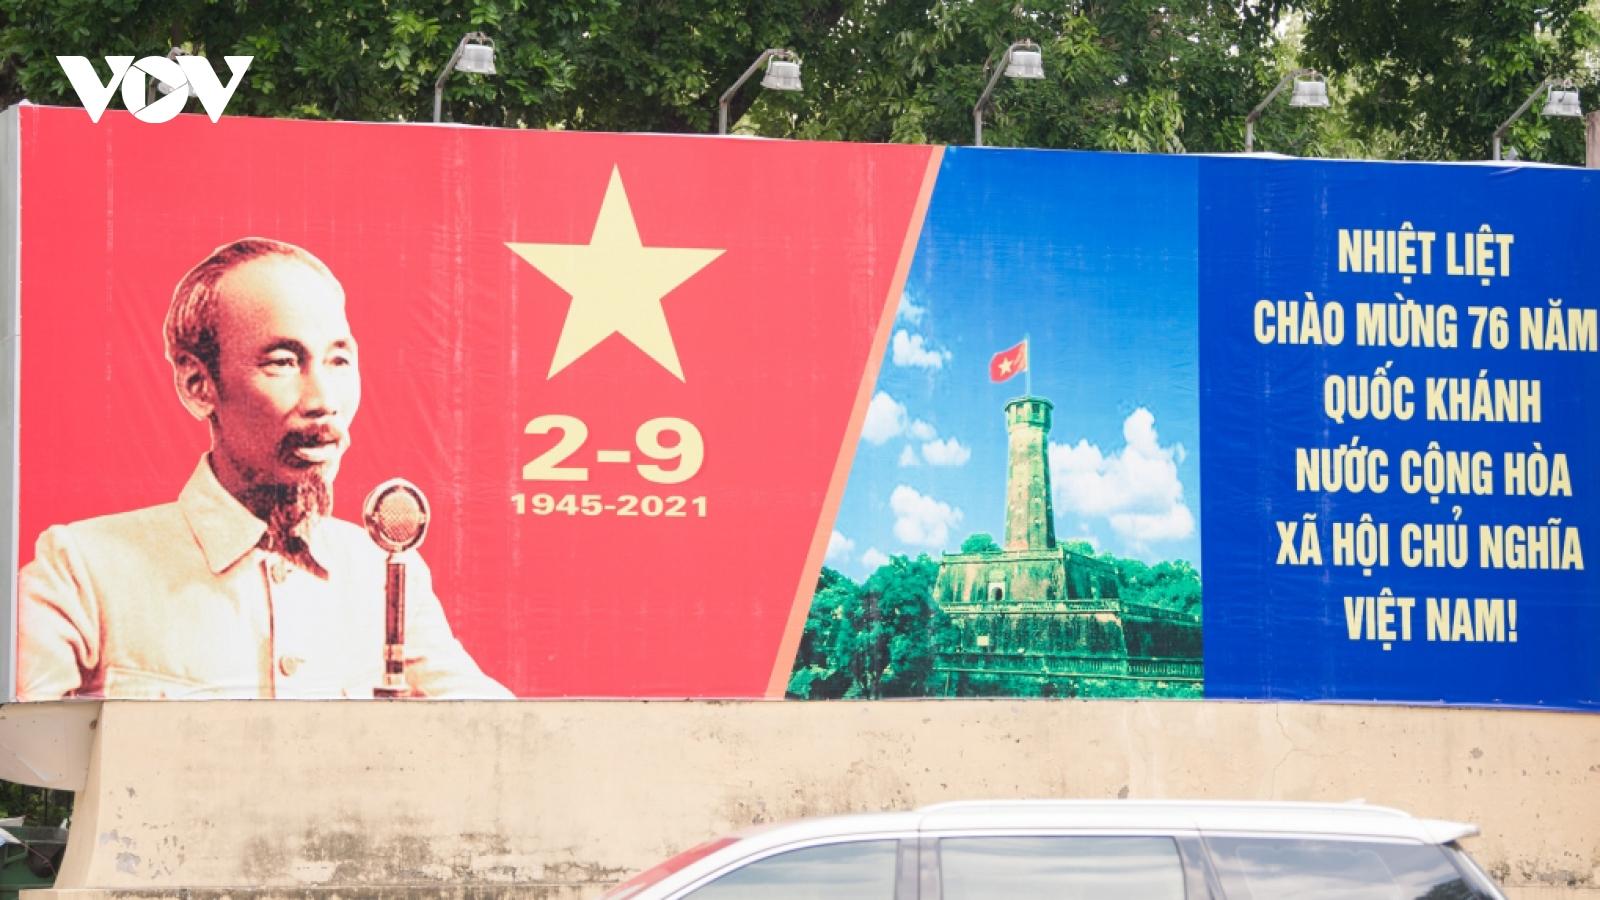 PM Pham Minh Chinh's 2021 National Day speech